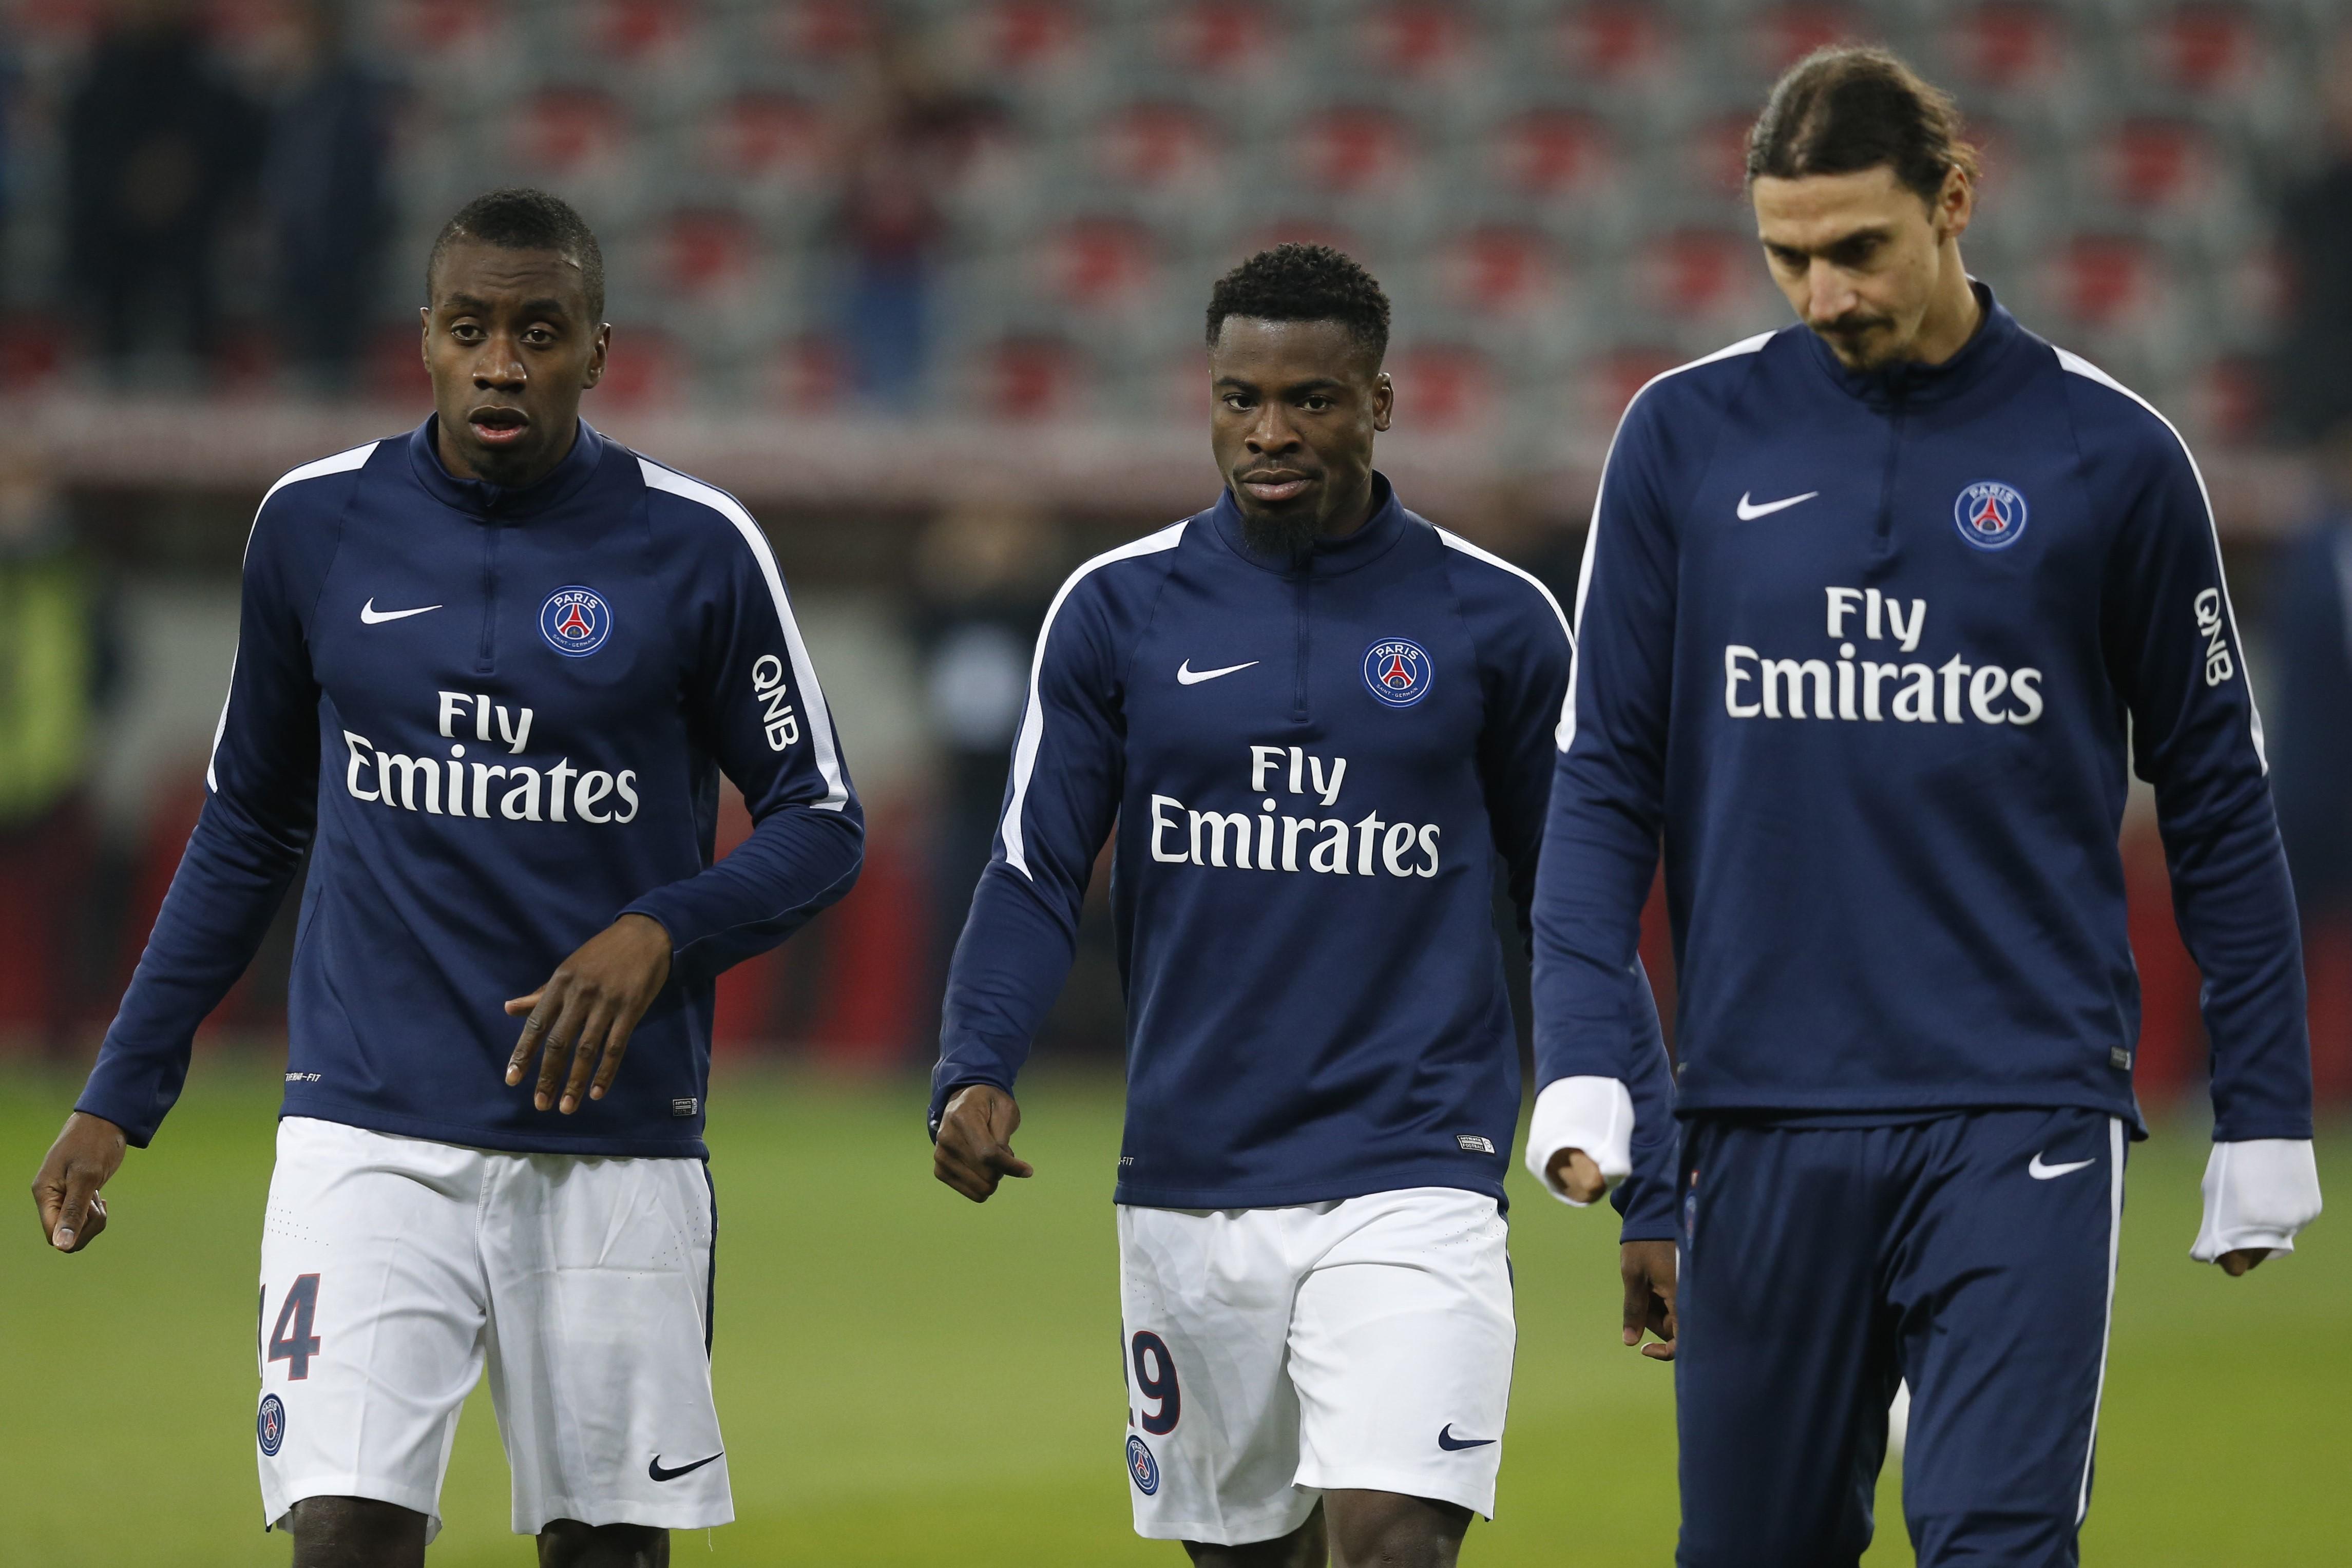 Blaise Matuidi, Serge Aurier et Zlatan Ibrahimovic